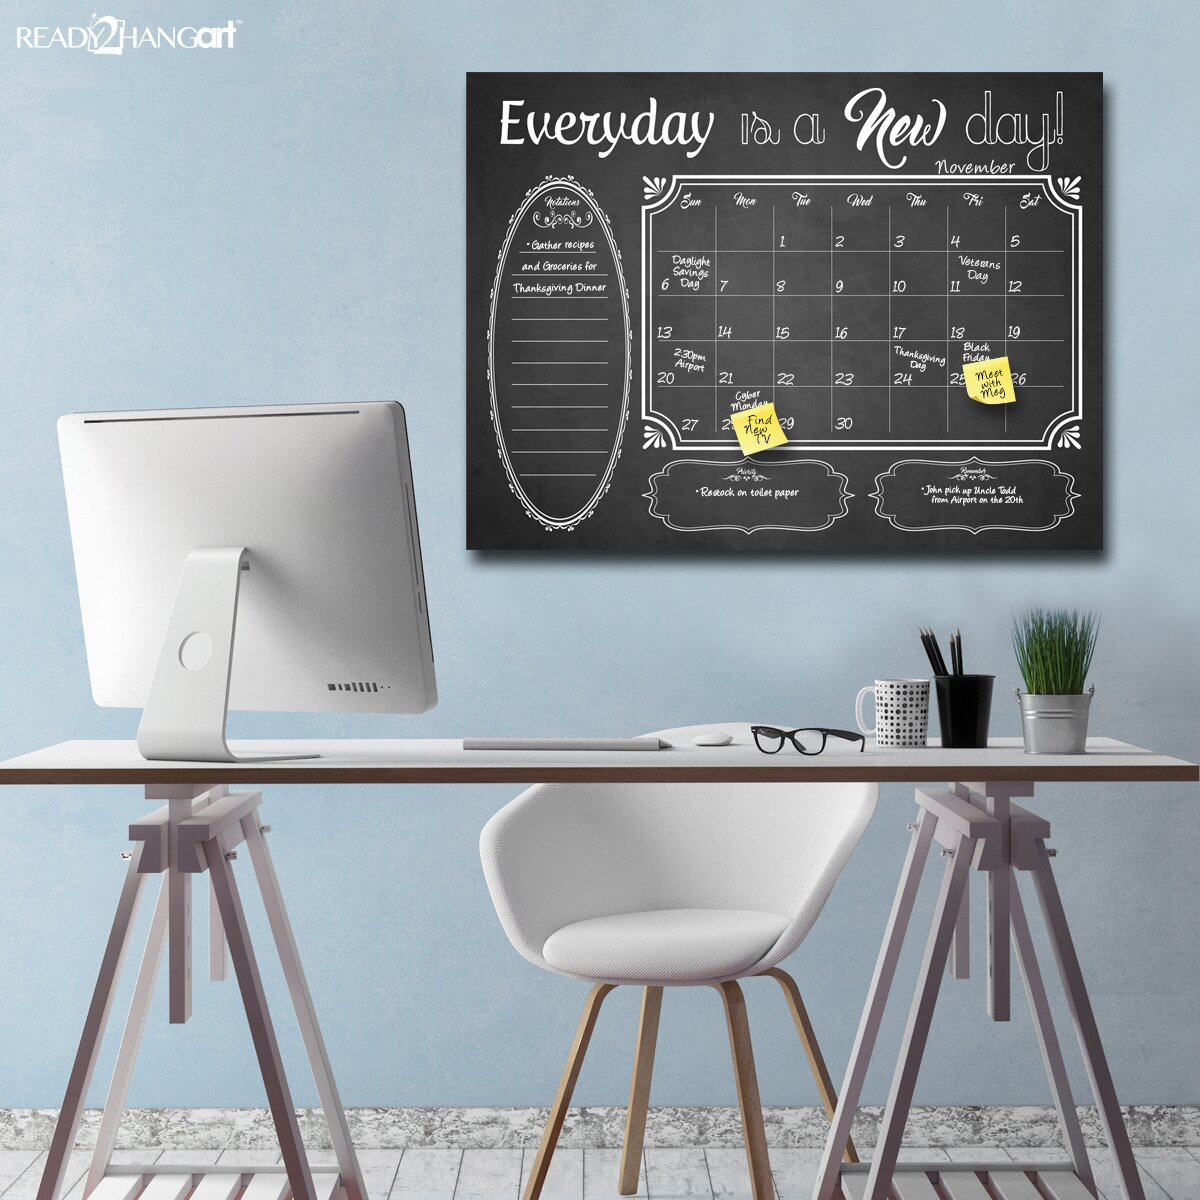 Ready2hangart Dry Erase Monthly Calendar Memo Board Reviews – Weekly Memo Calendar